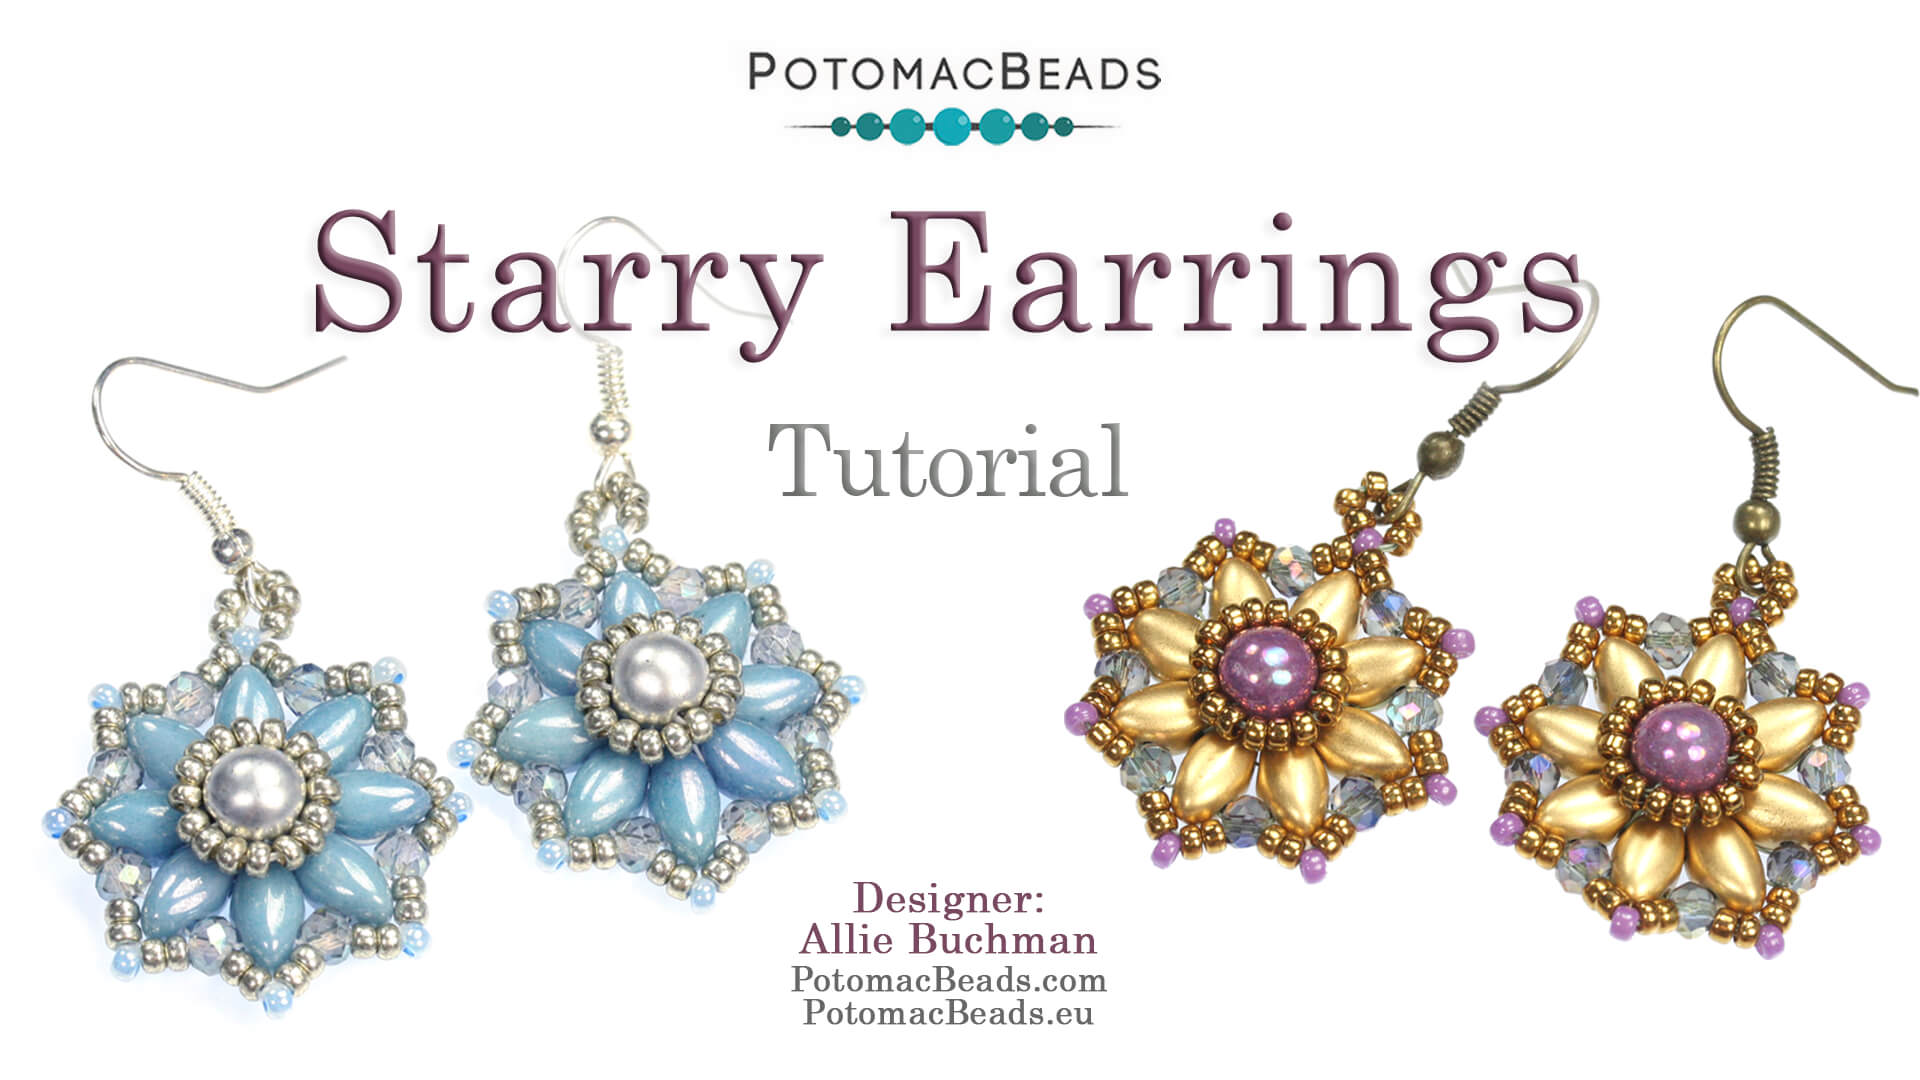 How to Bead / Videos Sorted by Beads / IrisDuo® Bead Videos / Starry Earrings Tutorial